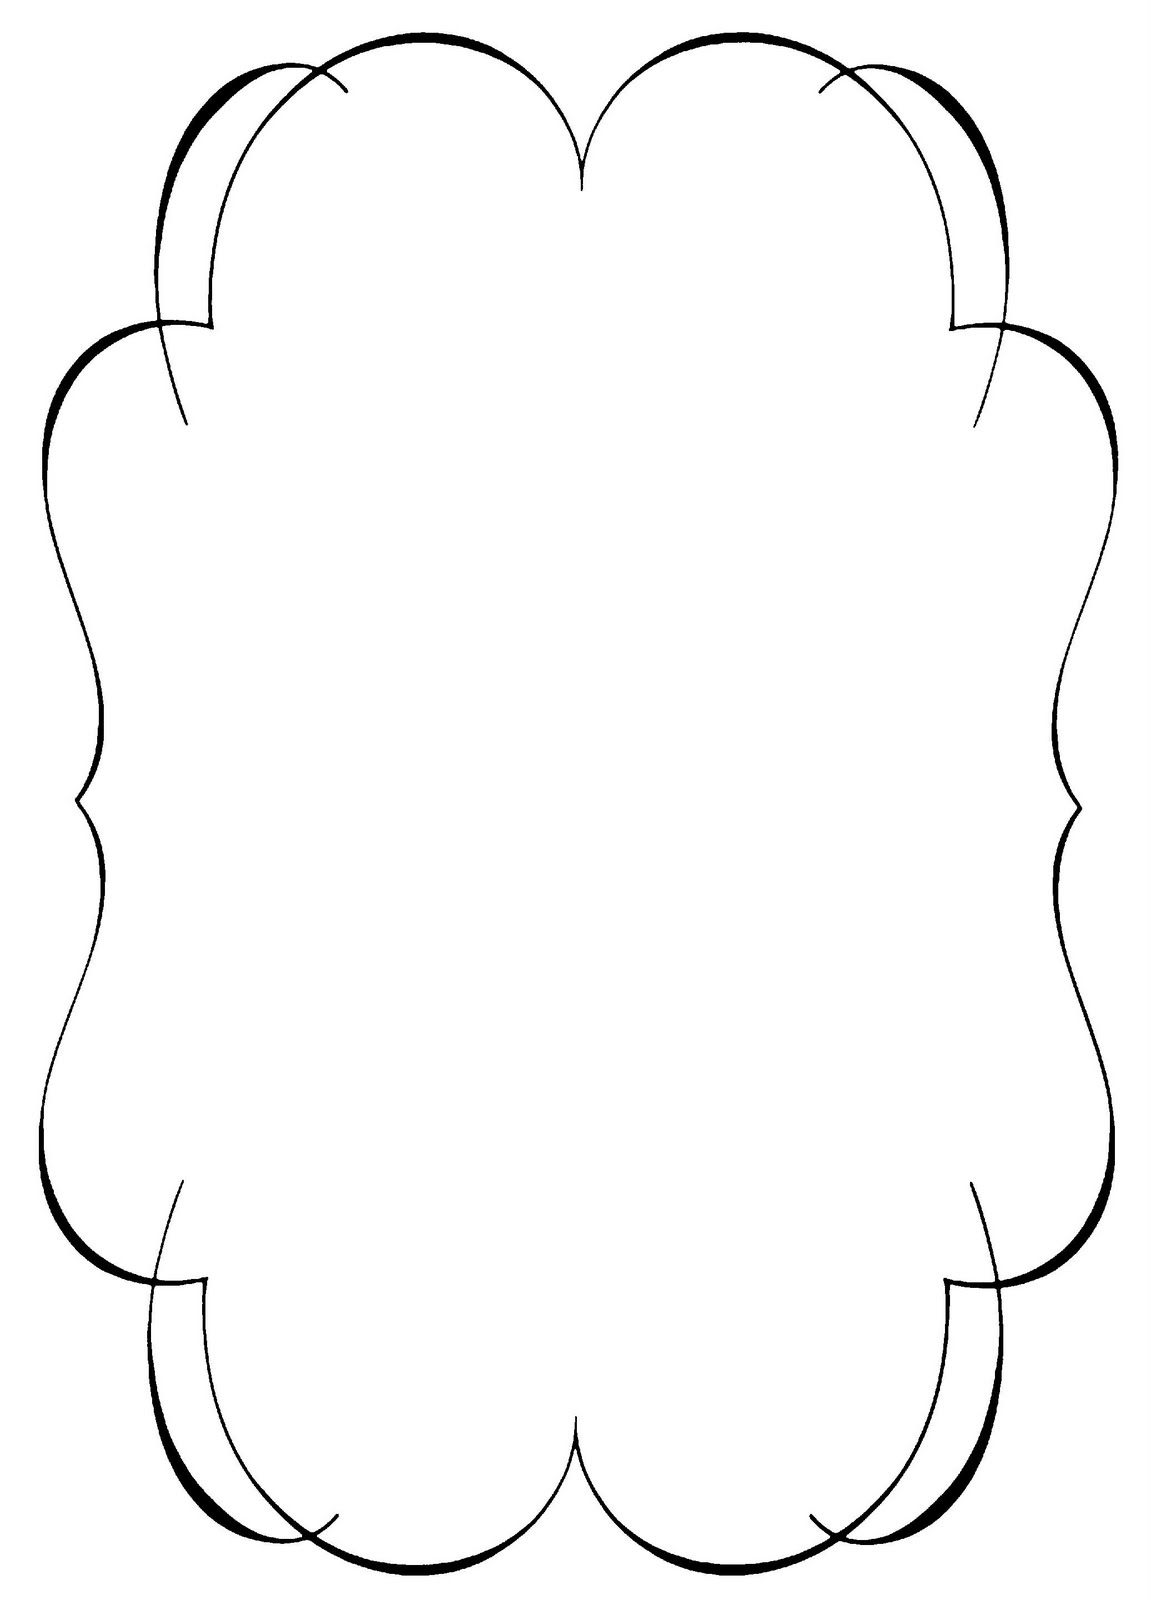 40 Stunning Free Clip Art Borders-40 Stunning Free Clip Art Borders-1